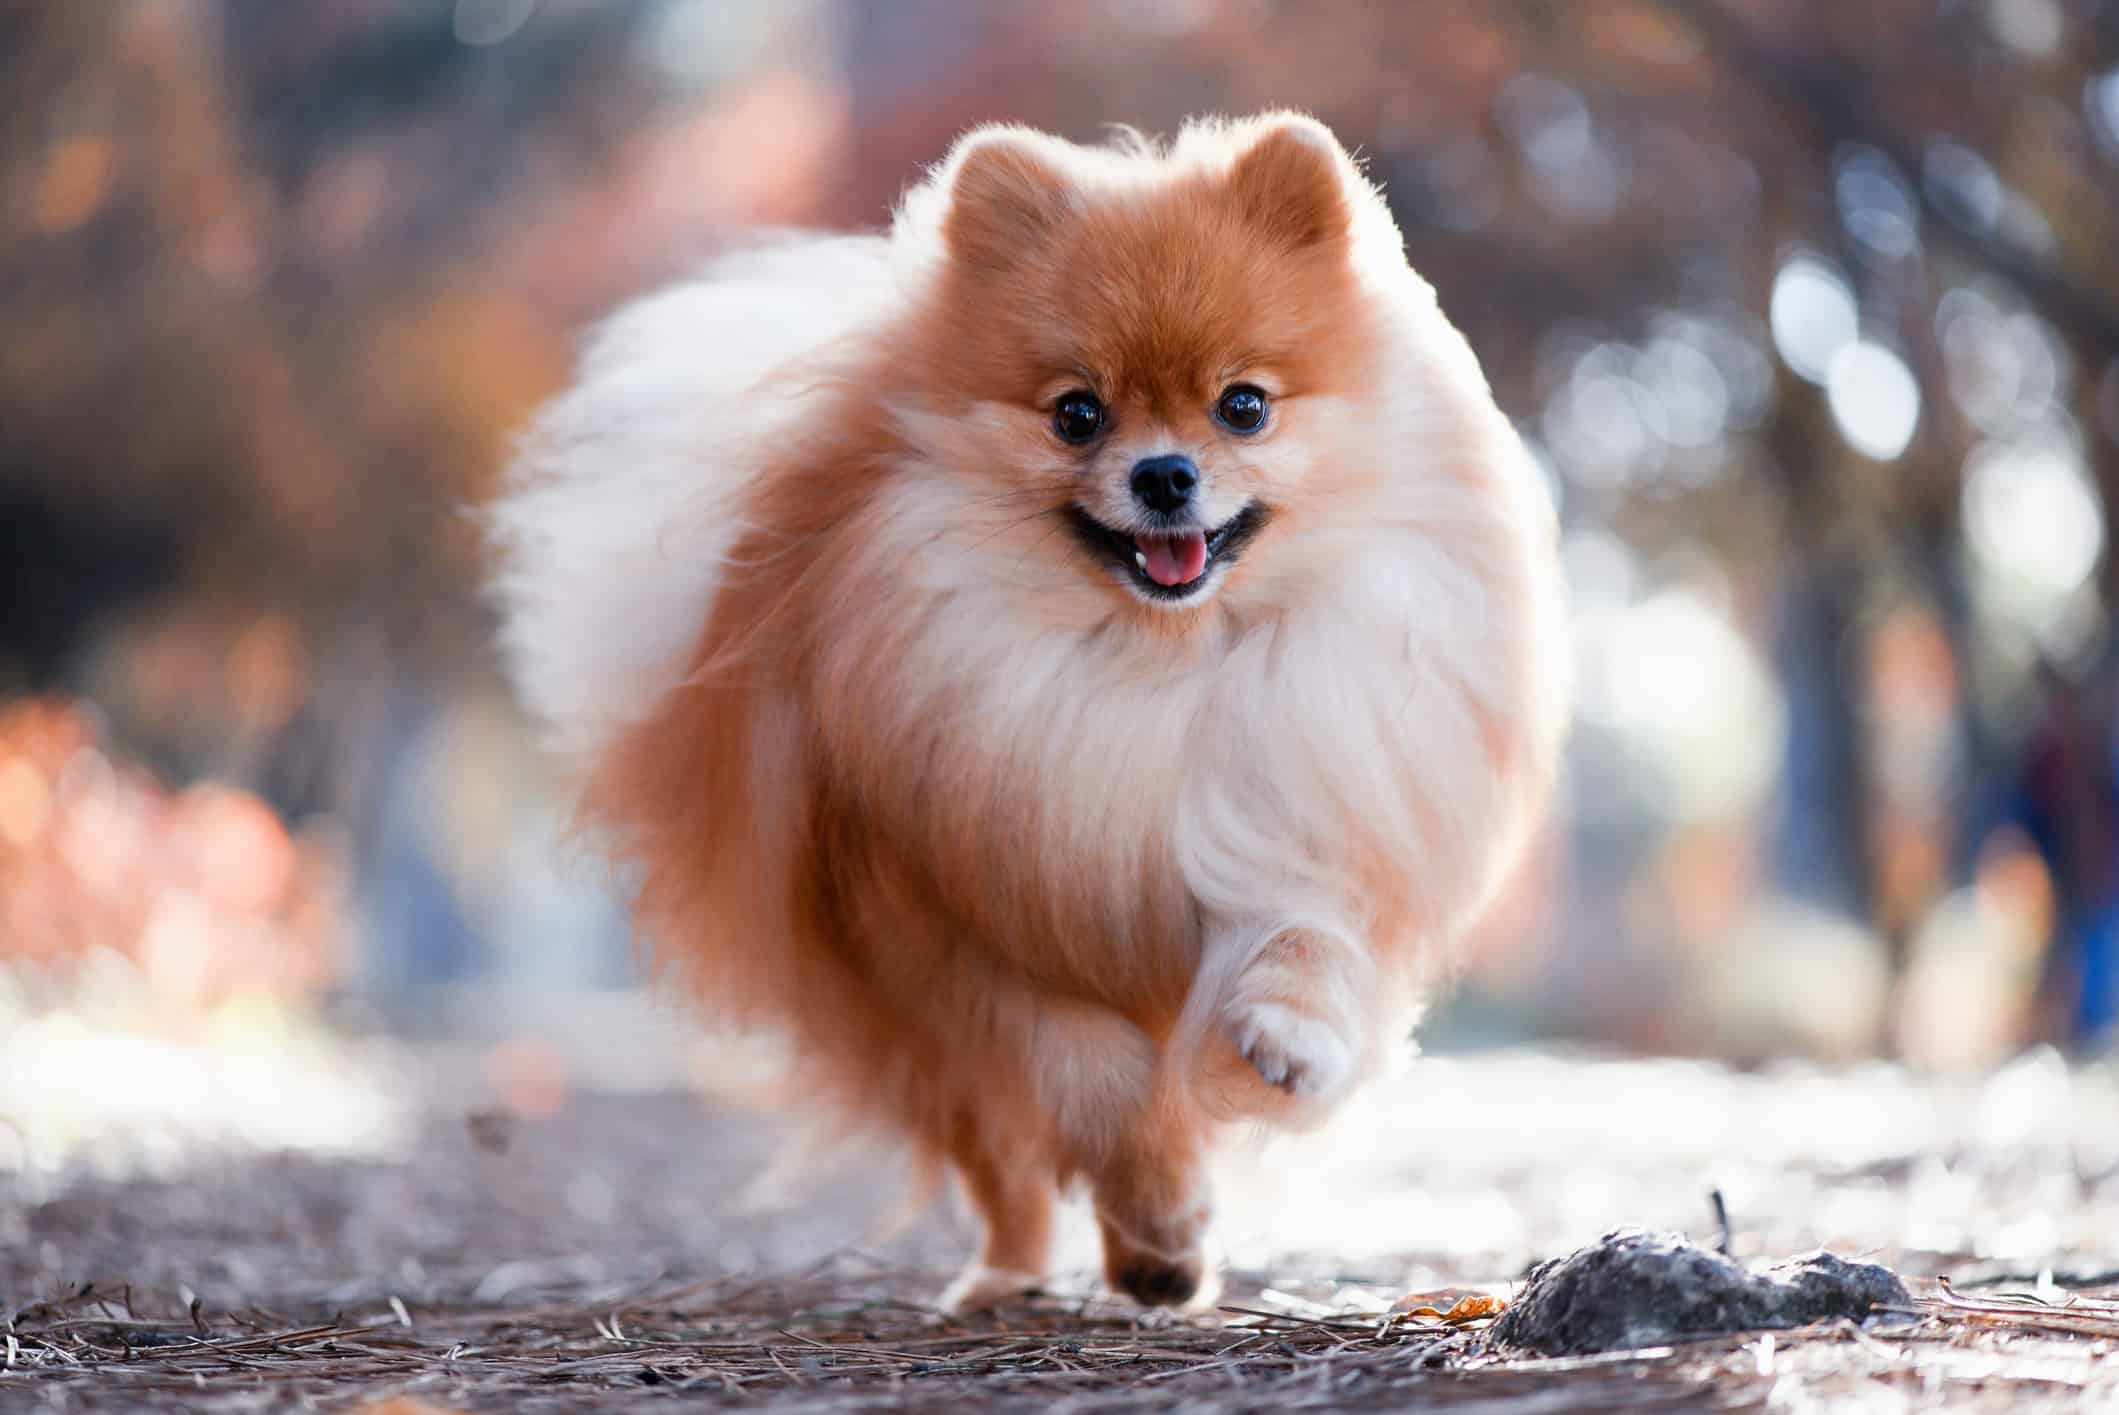 pomeranian running and happy